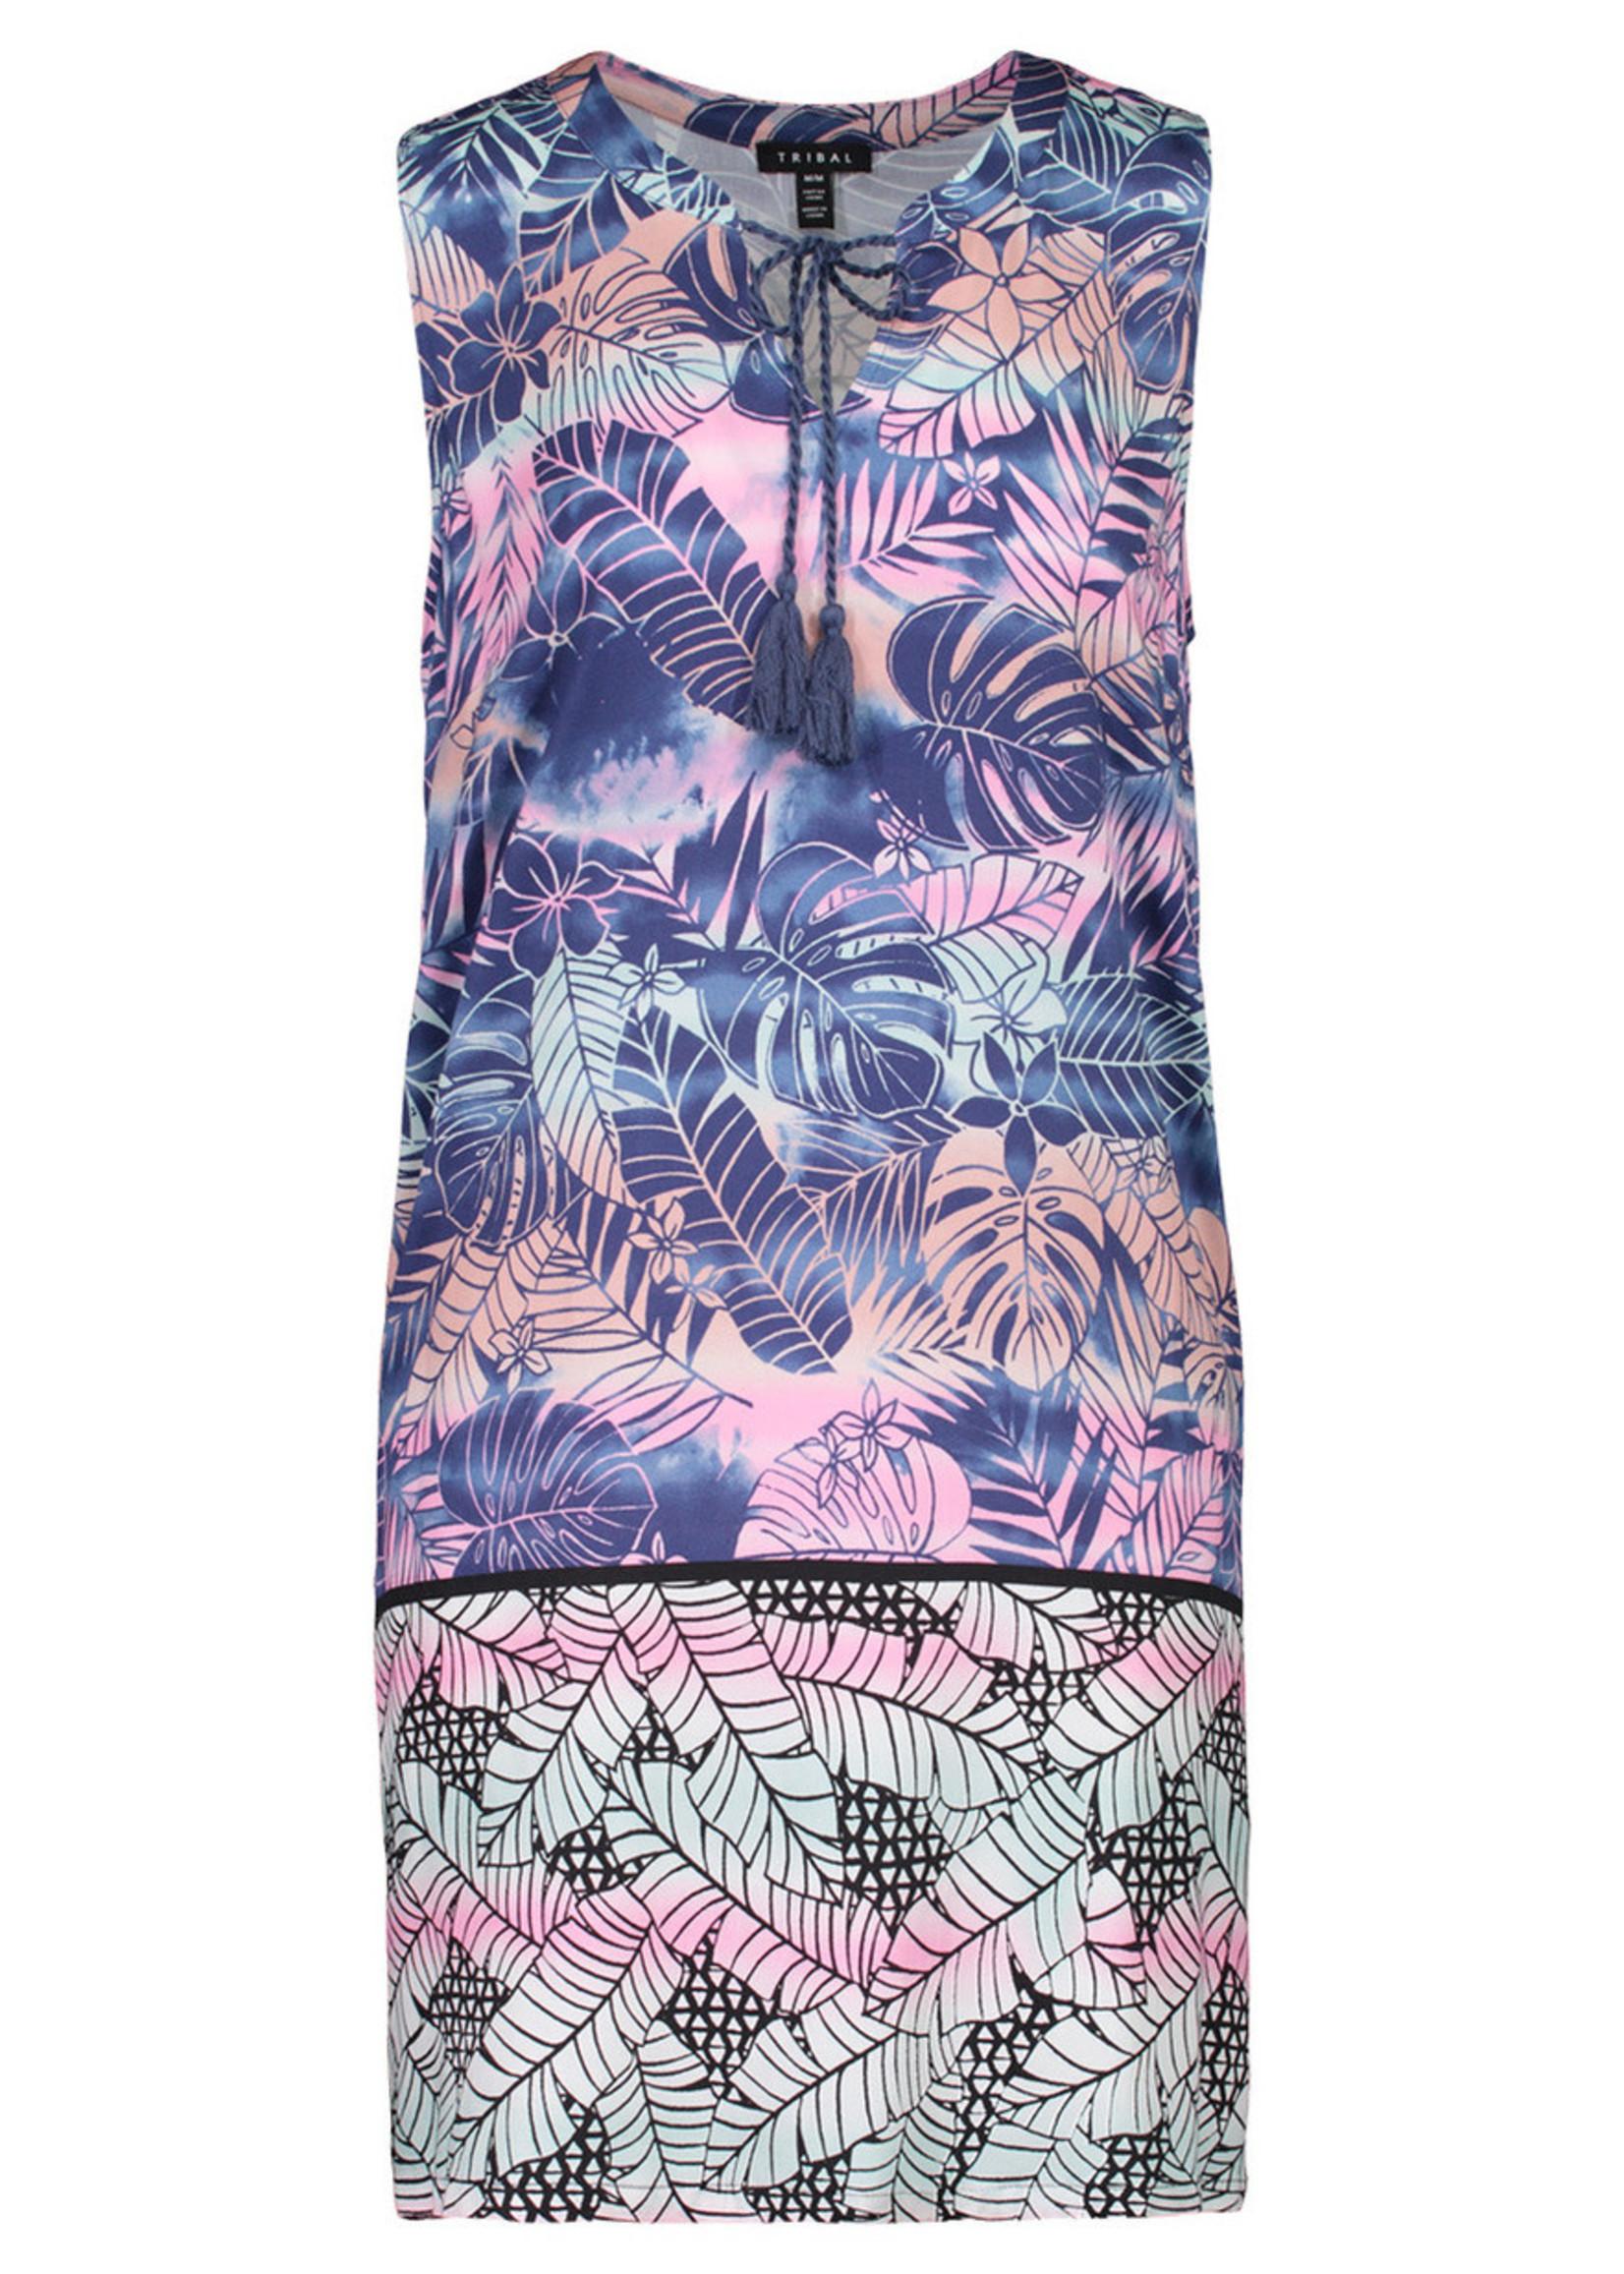 Tribal Tribal Sleeveless Dress with Tassels